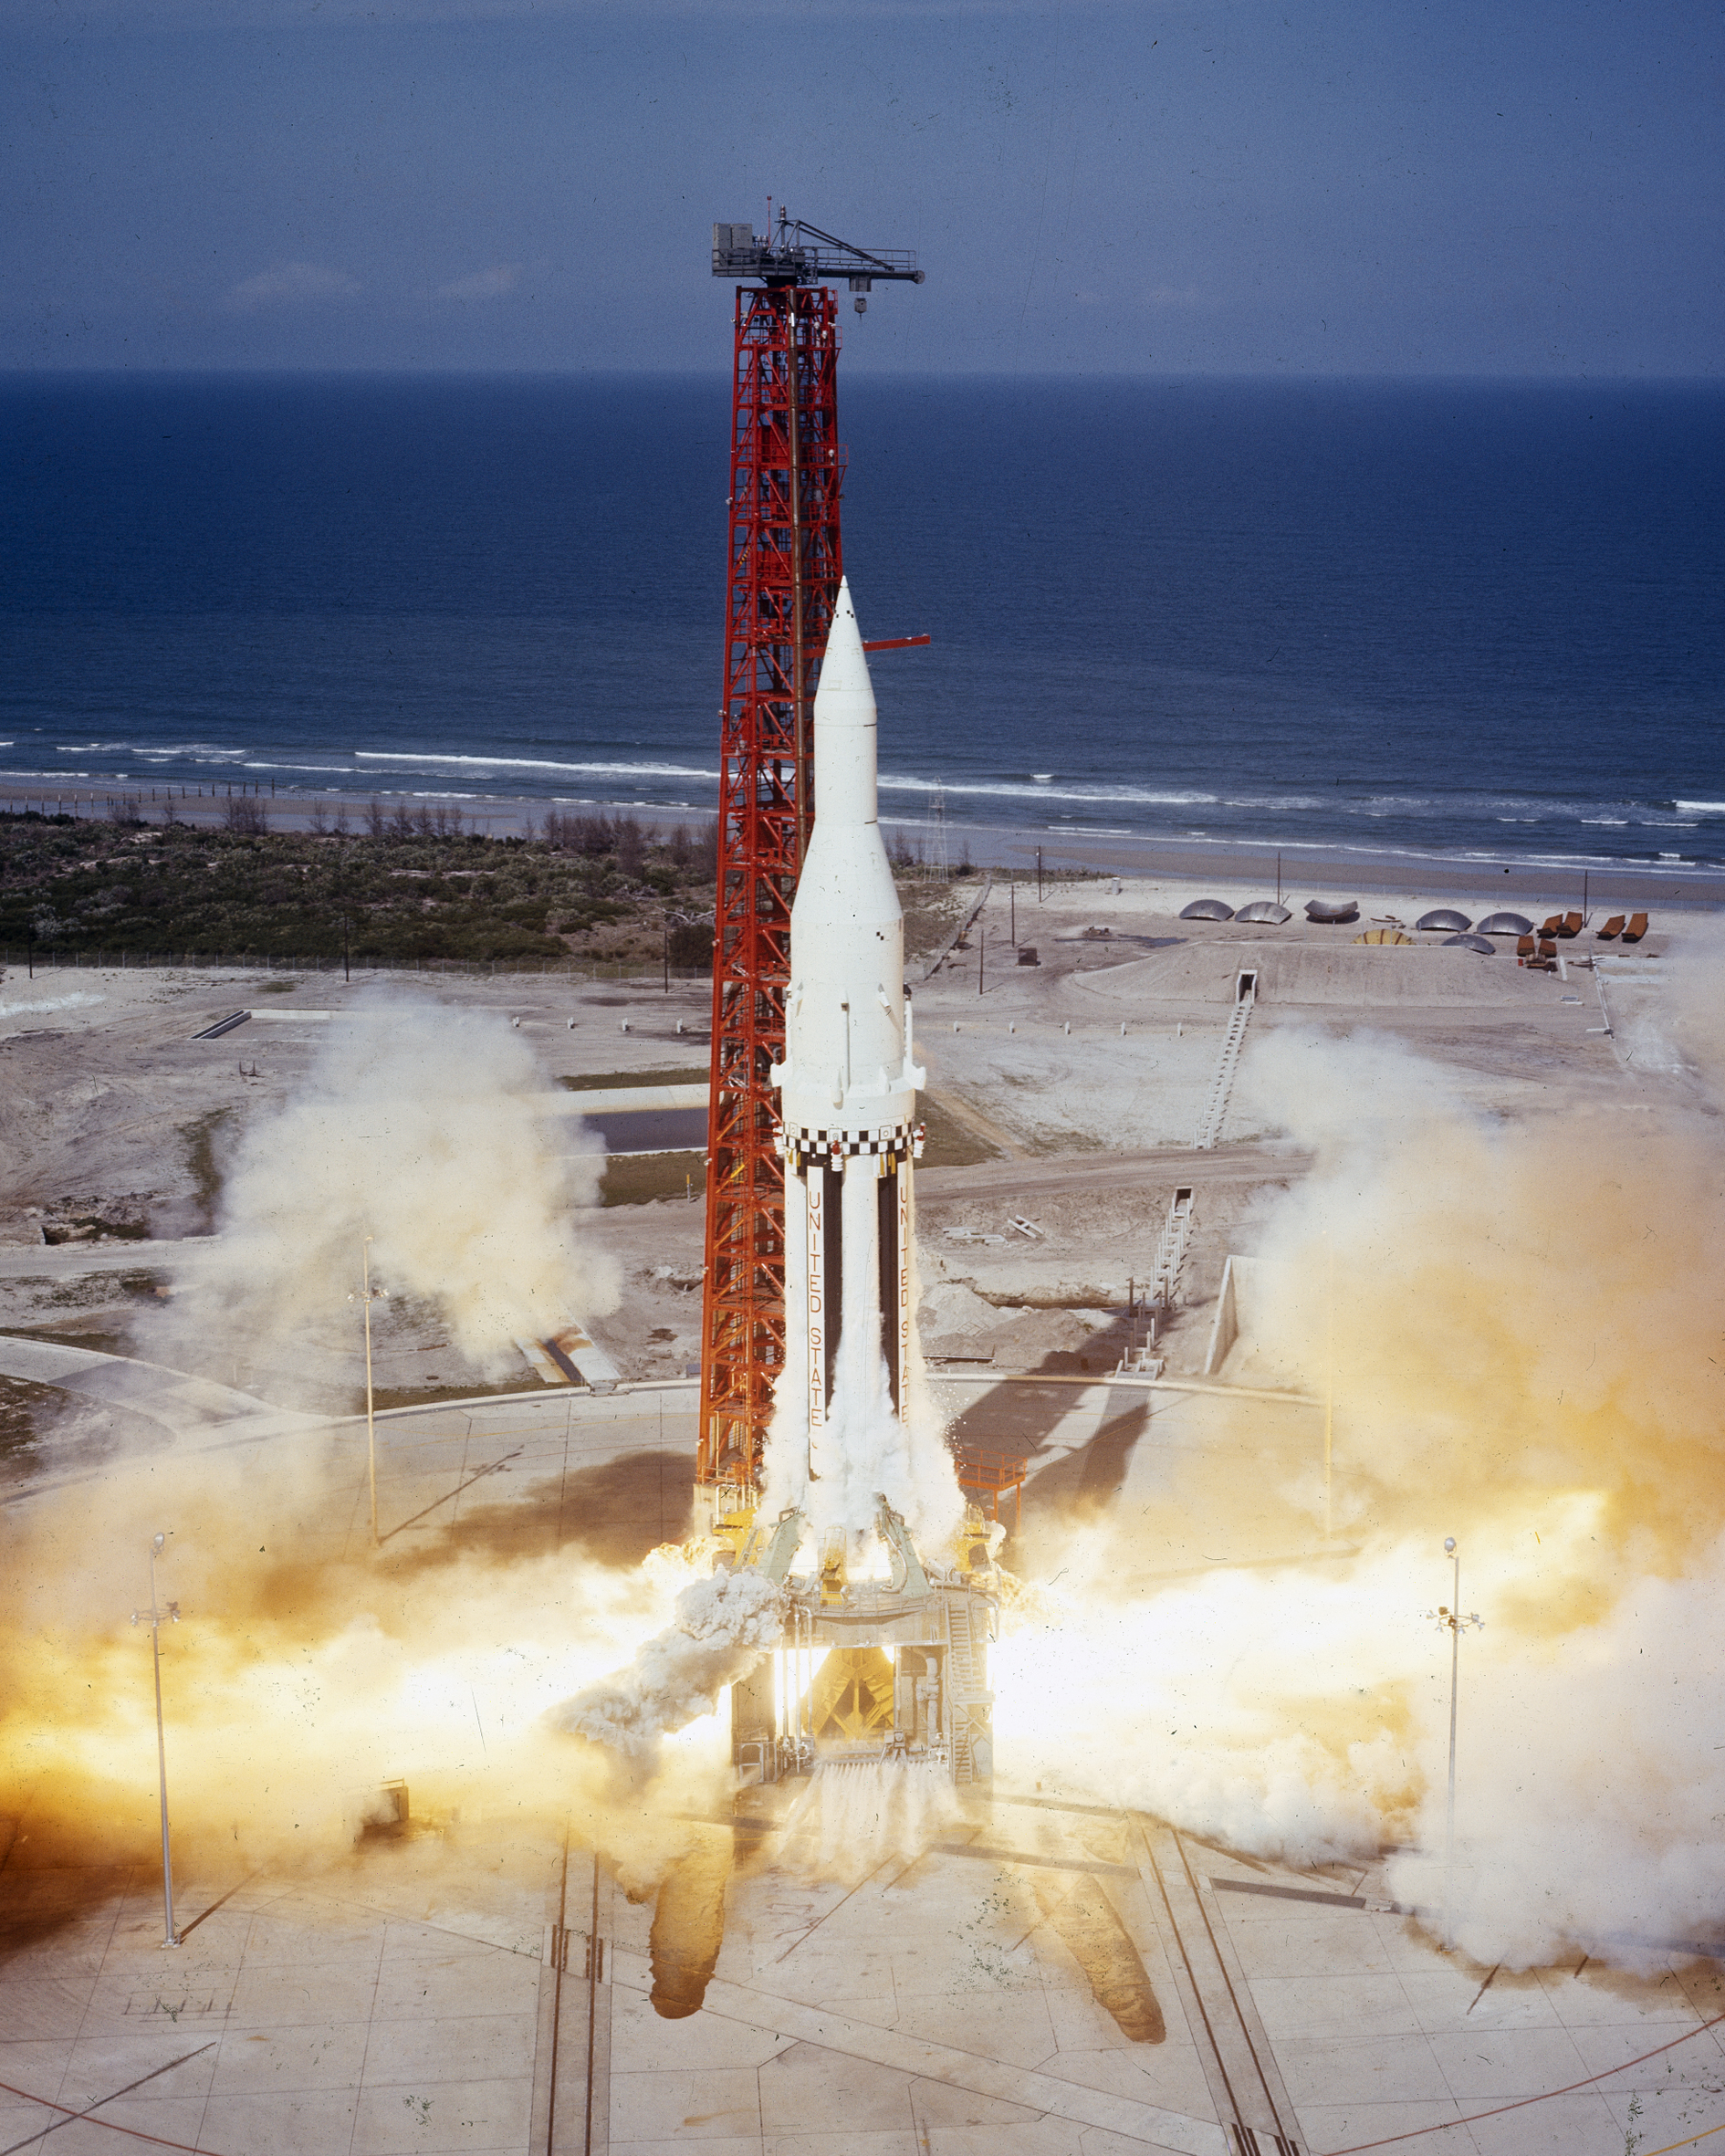 Saturn I SA-4 - 28.3.1963 Saturn-Apollo_4_launches_from_KSC_%28MSFC-6413722%29